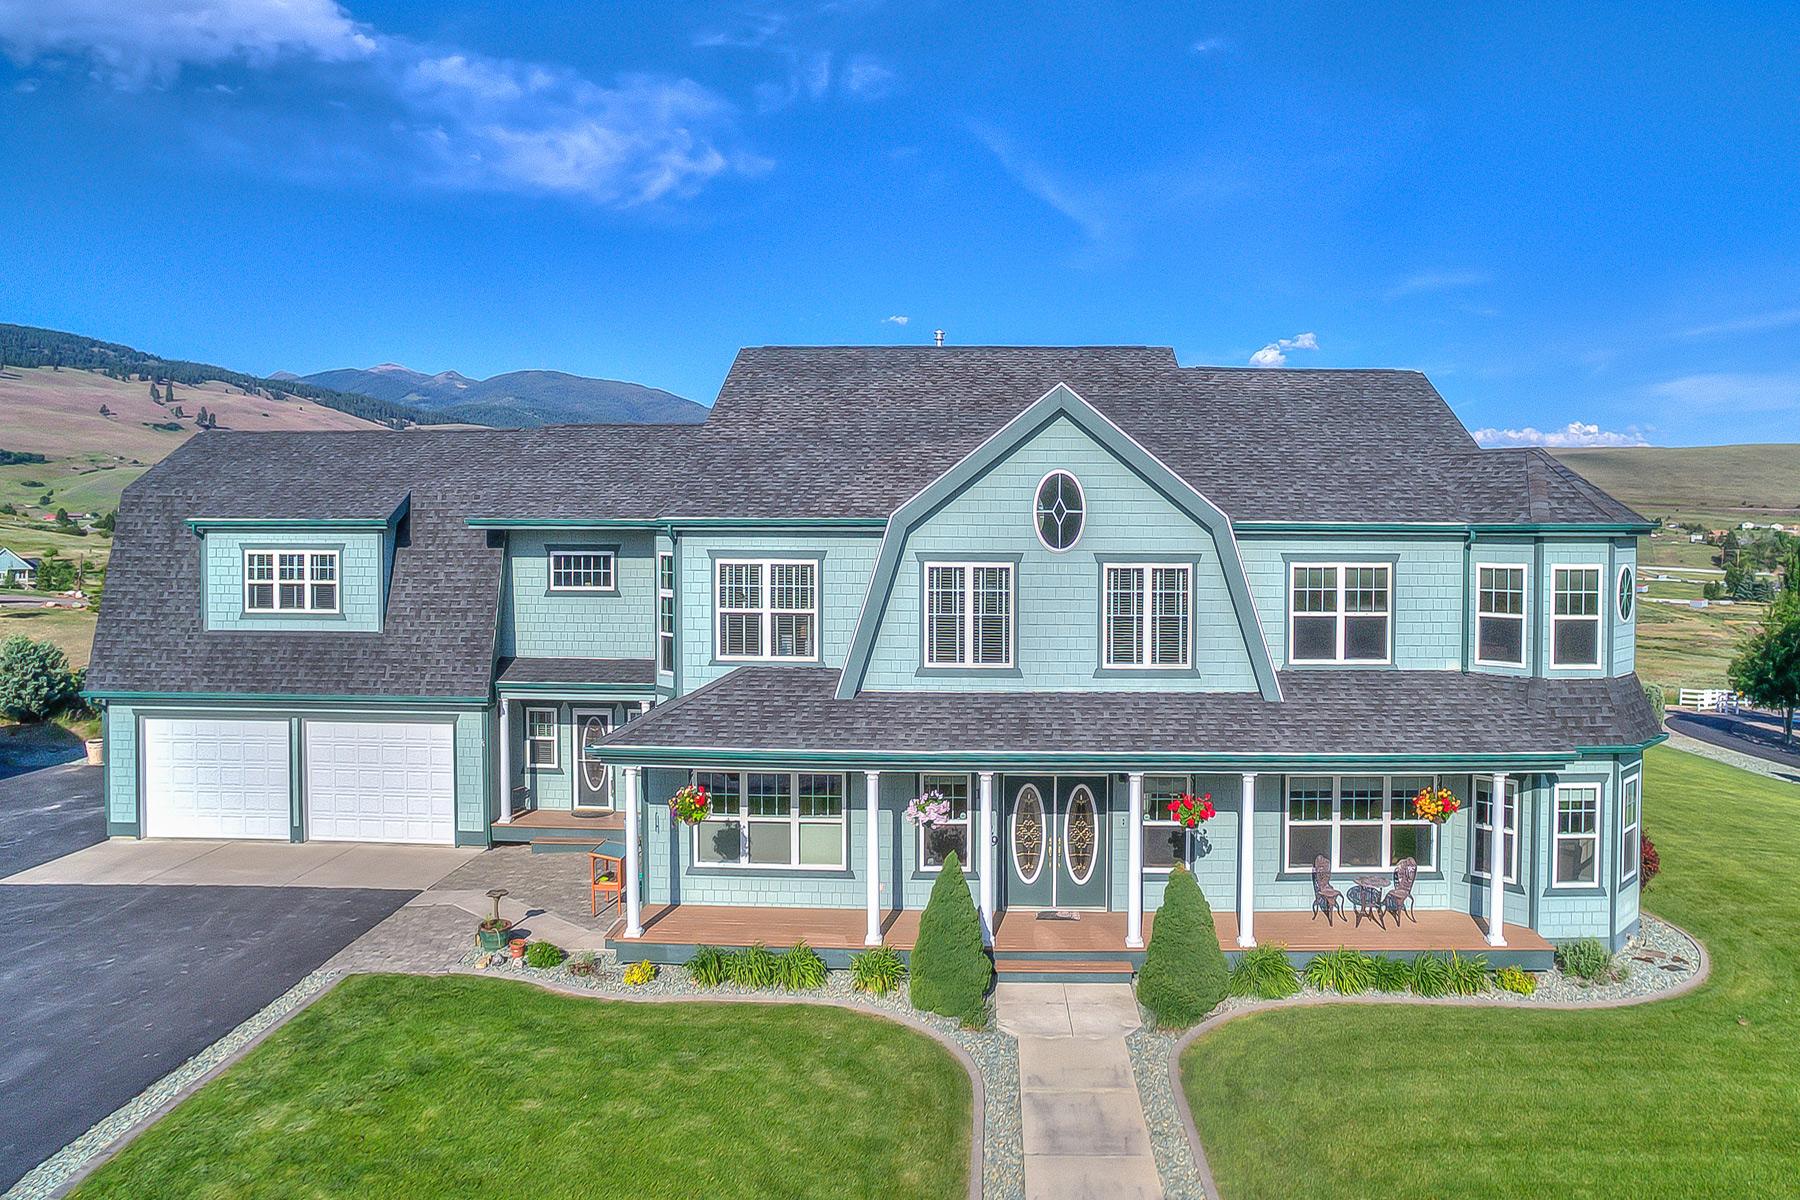 Villa per Vendita alle ore 11329 Tookie Trek Missoula, Montana 59808 Stati Uniti